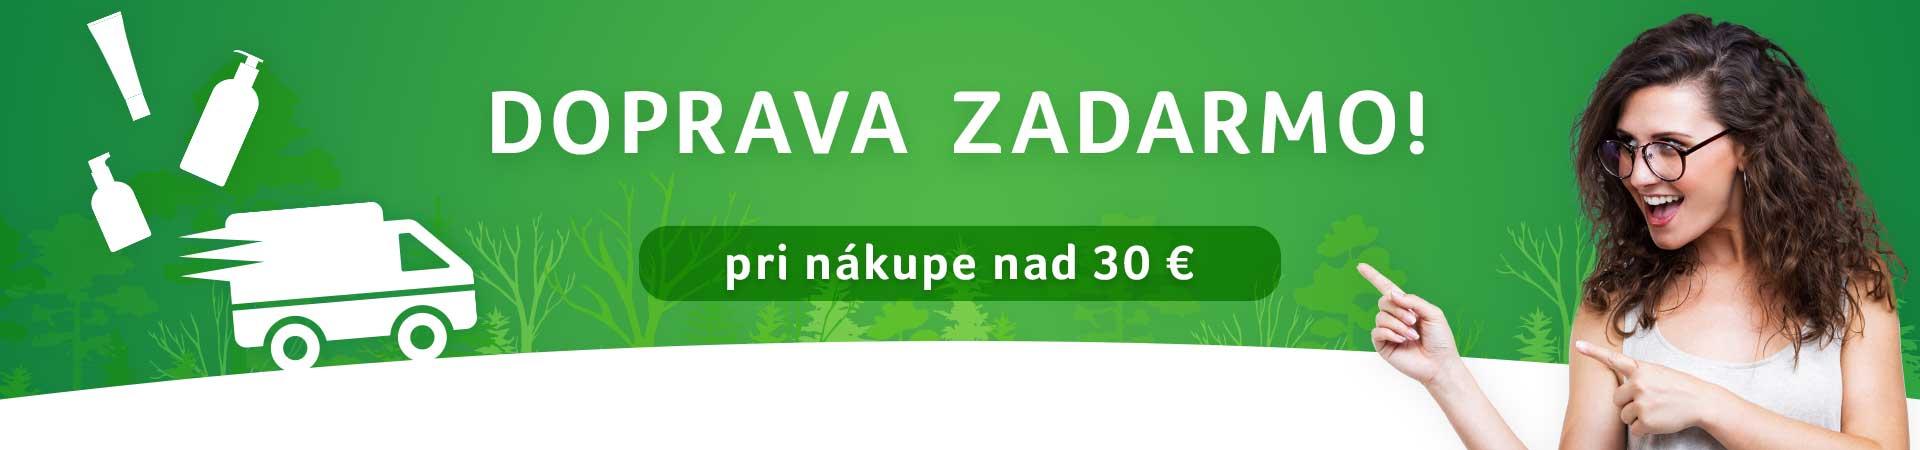 Doprava zadarmo nad 30 eur do 19.01.2019